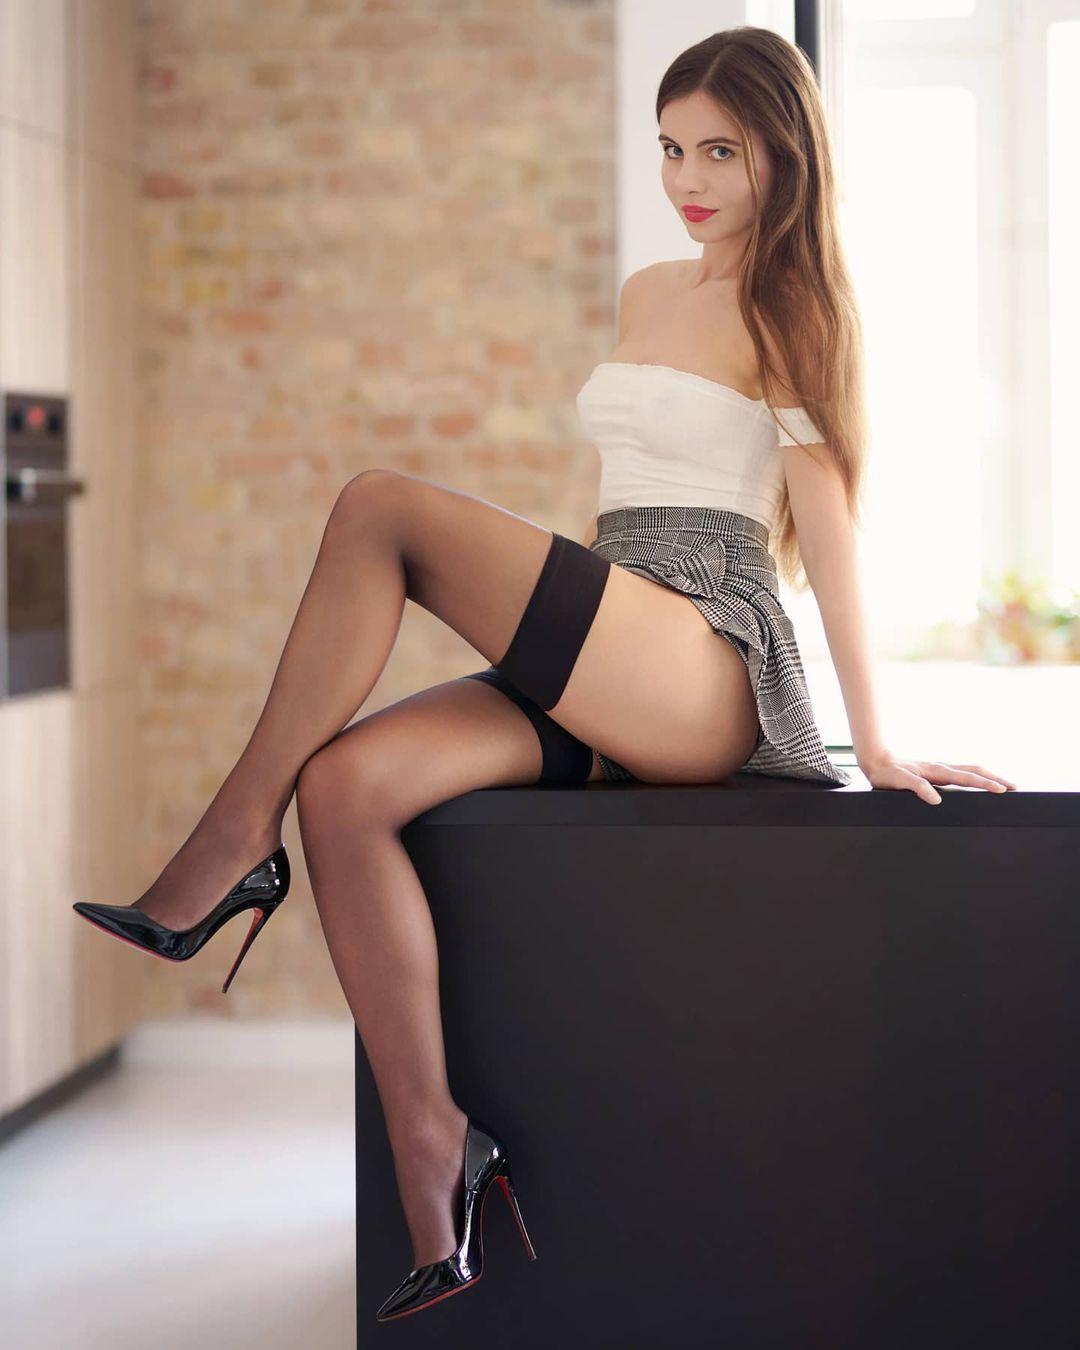 Ariadna - девушка дня из инстаграм (27 Фото) 1